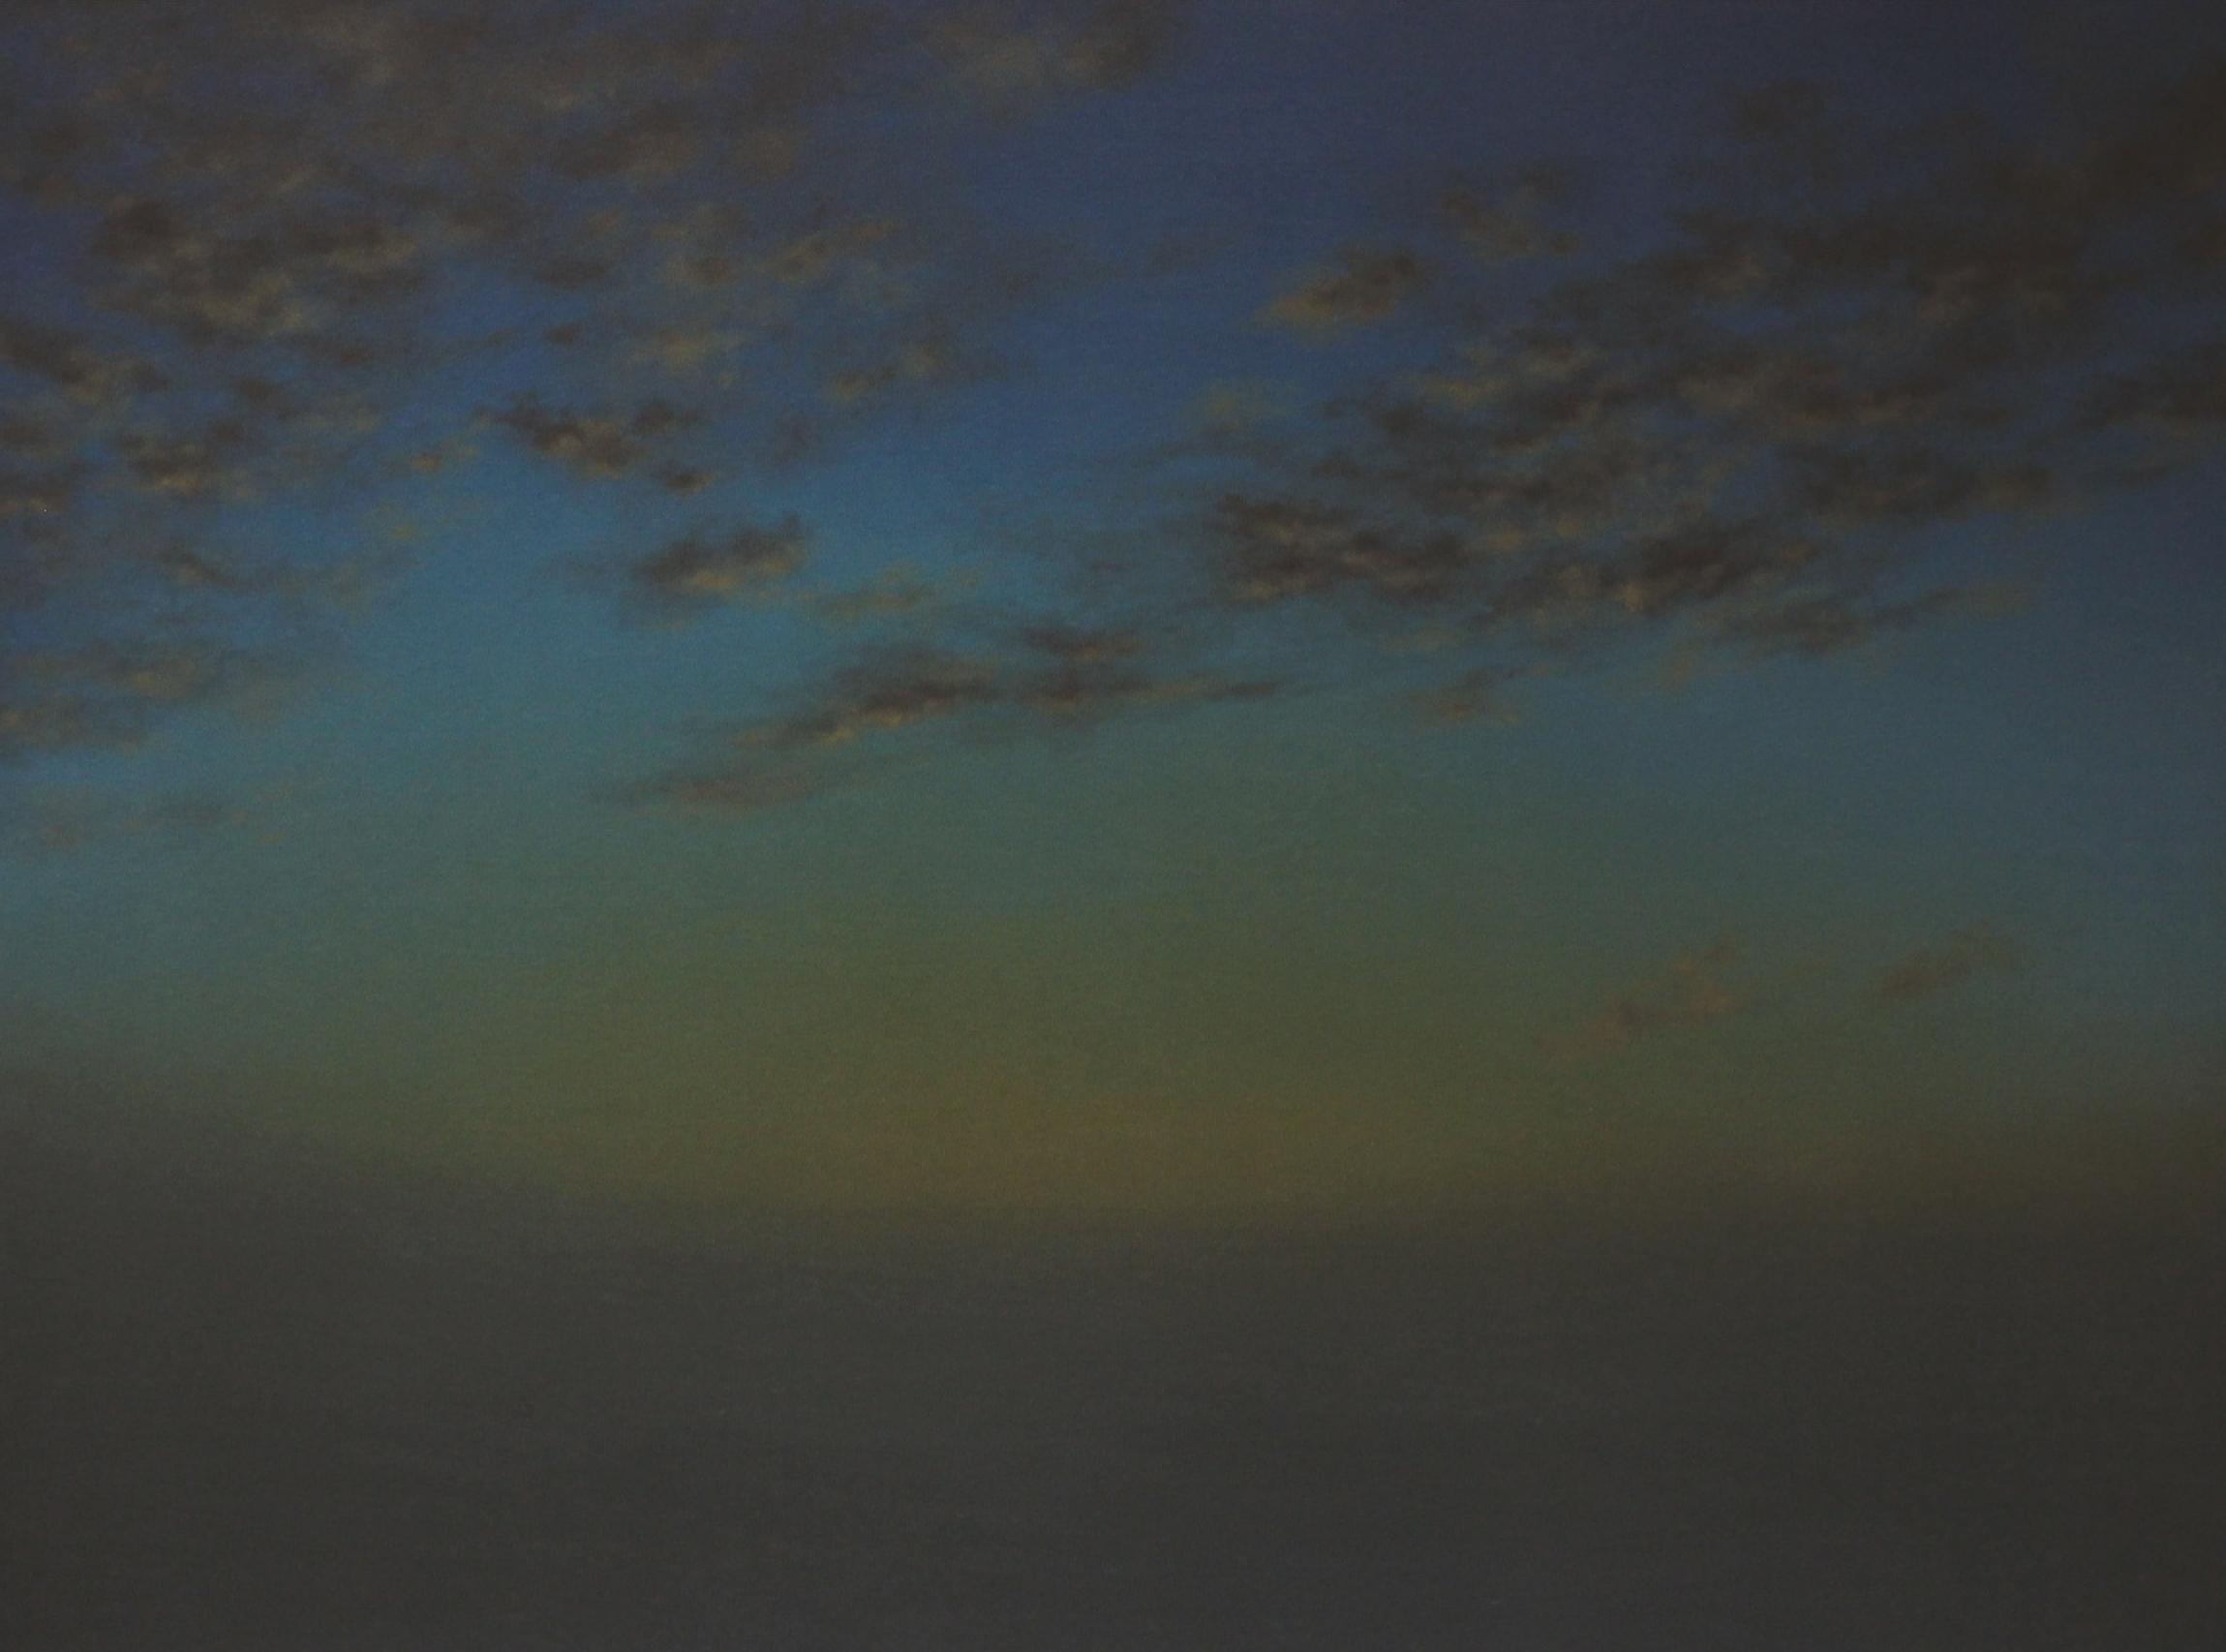 Radhika Kacha   Untitled   2017   Oil on Canvas   36 x 48 in.